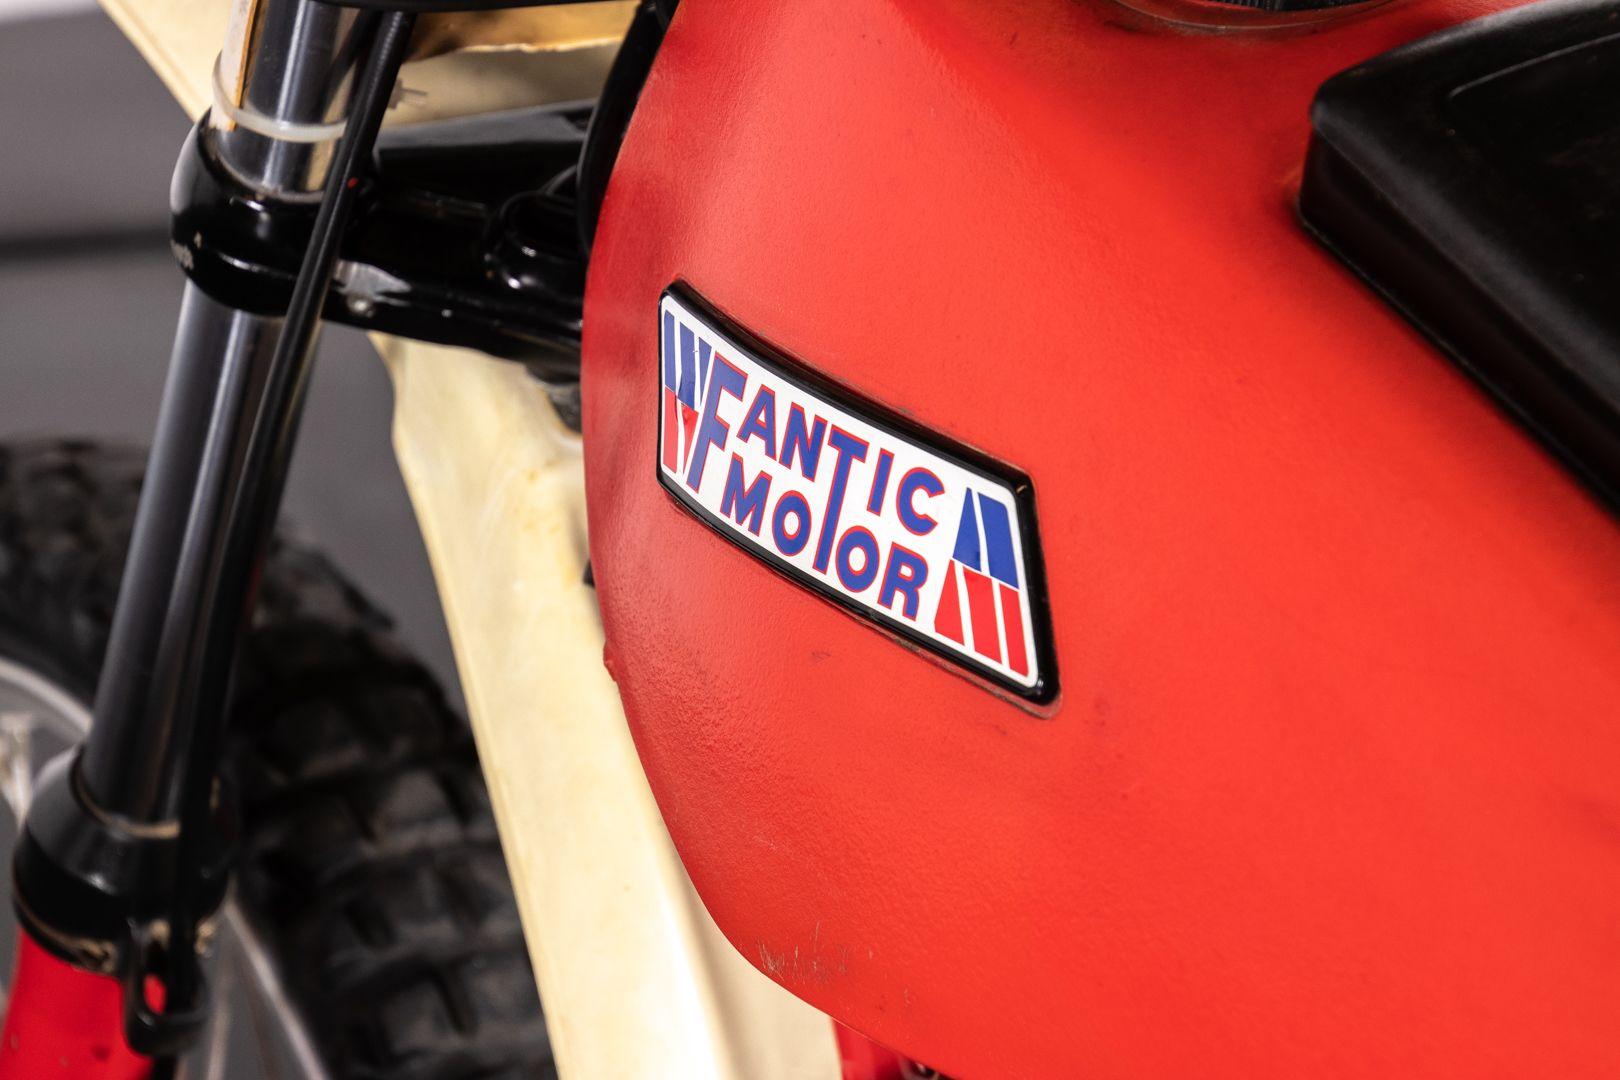 2000 FANTIC MOTOR TX 190 48879